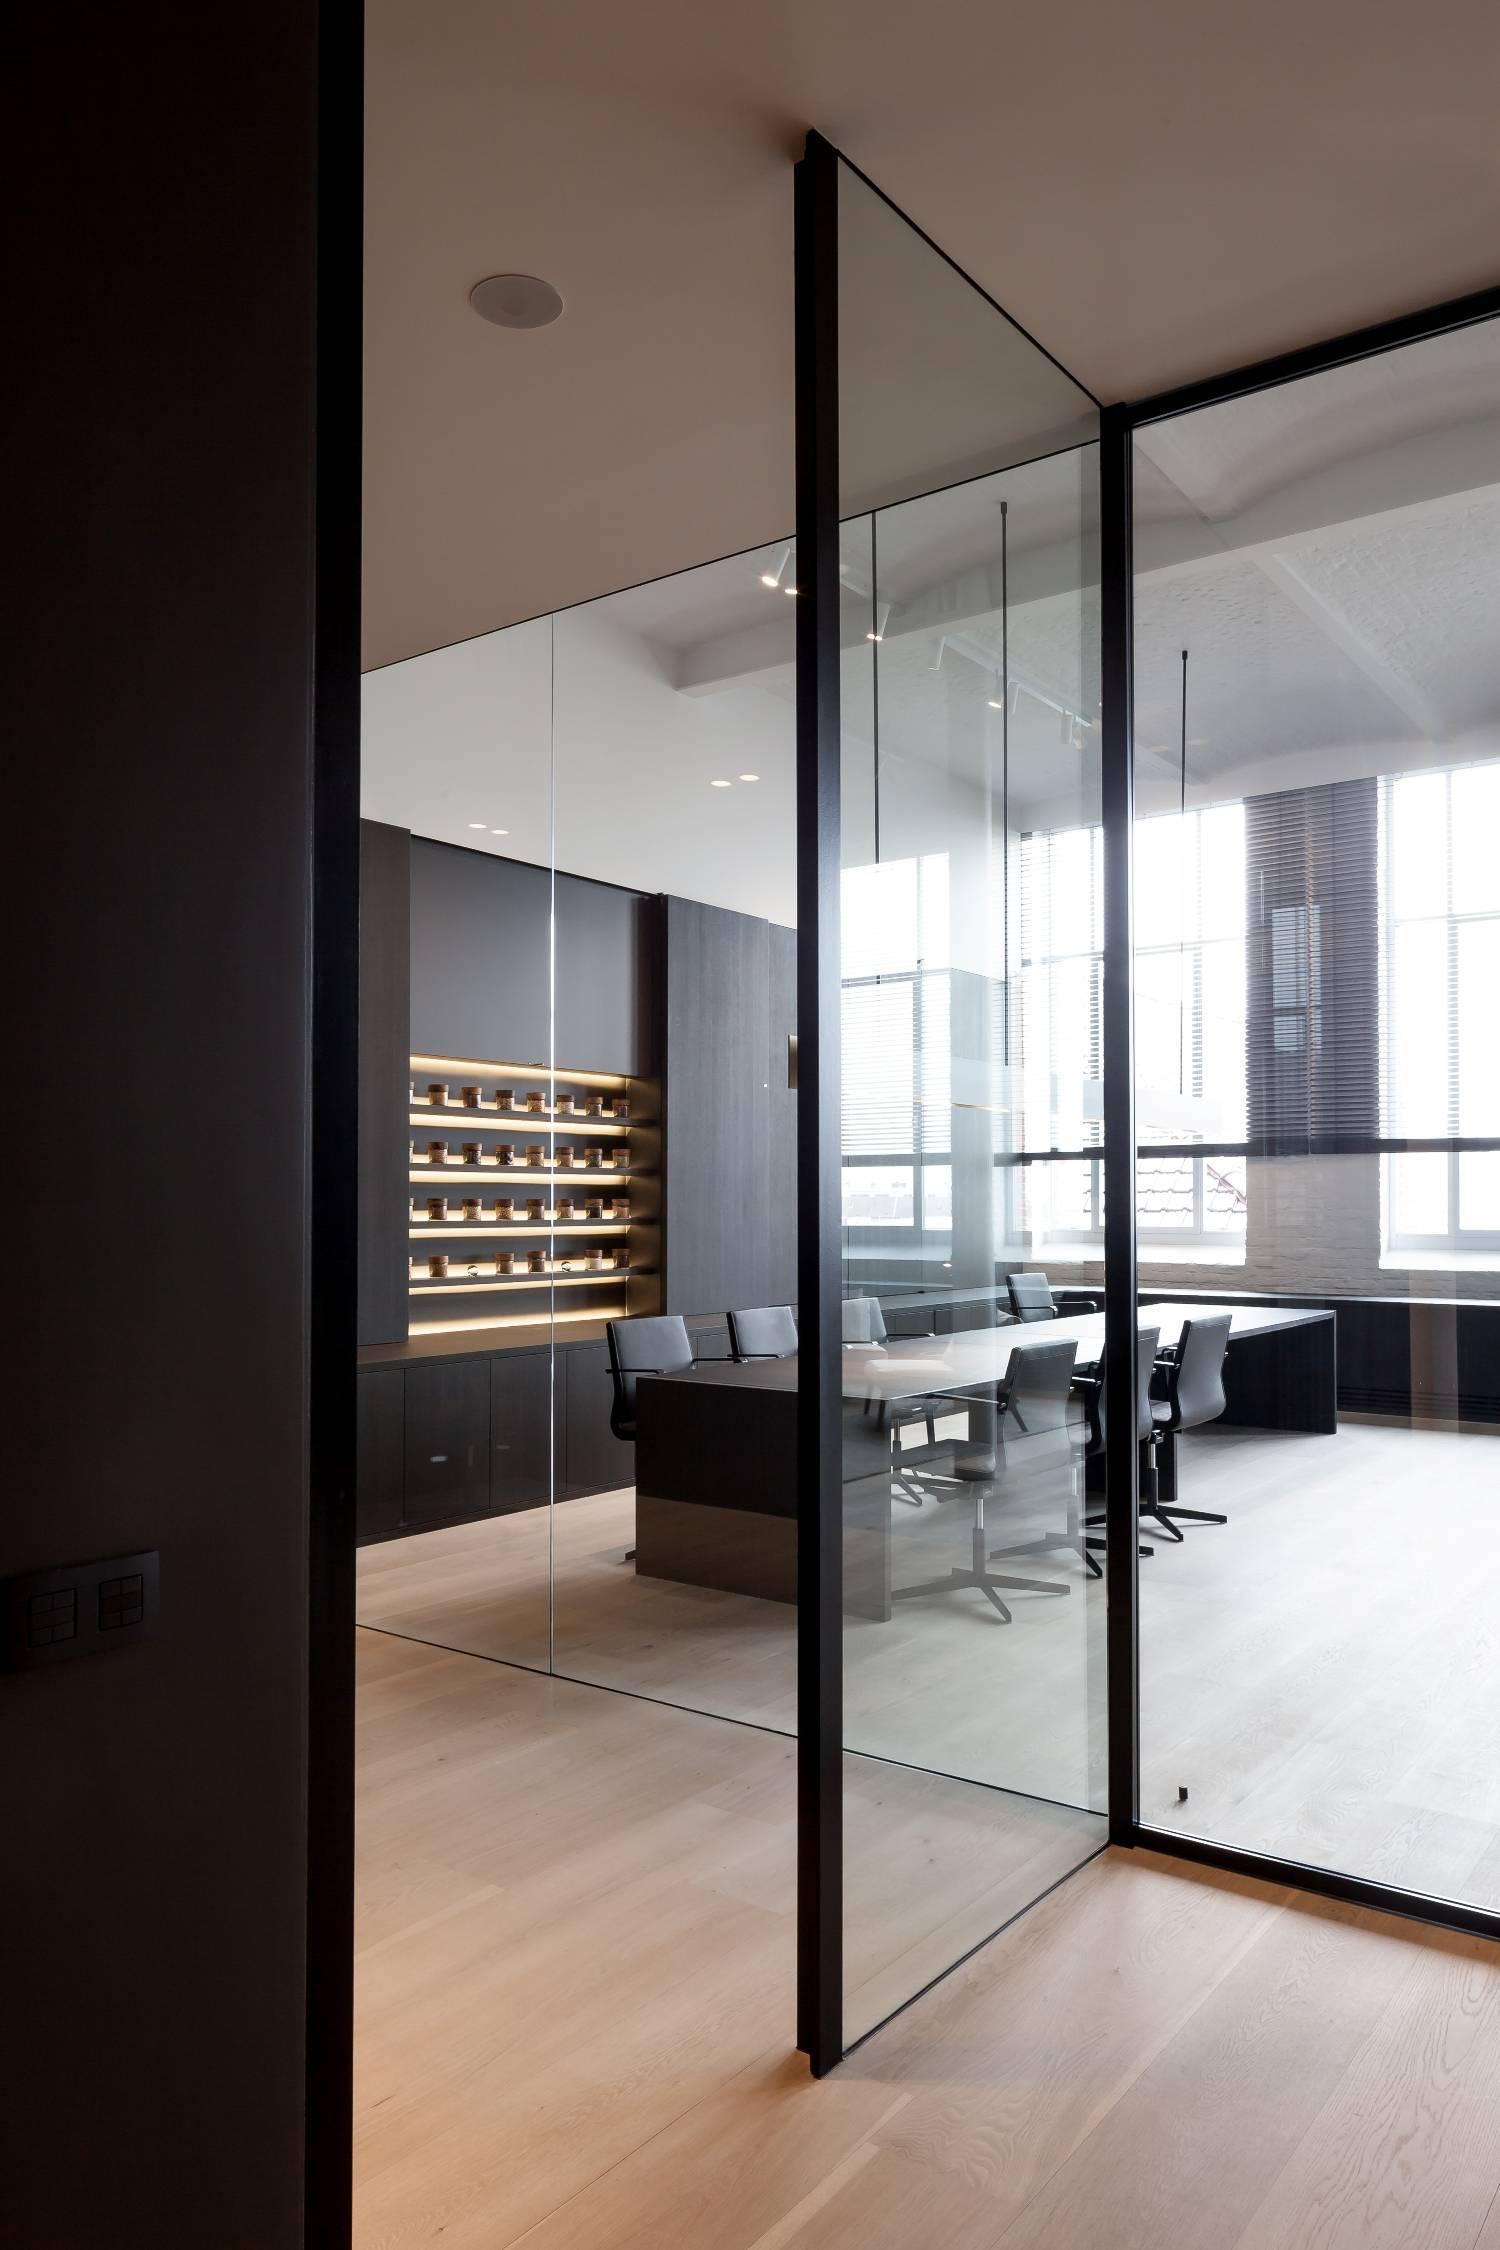 VVDA_H Offices_Thomas De Bruyne_3